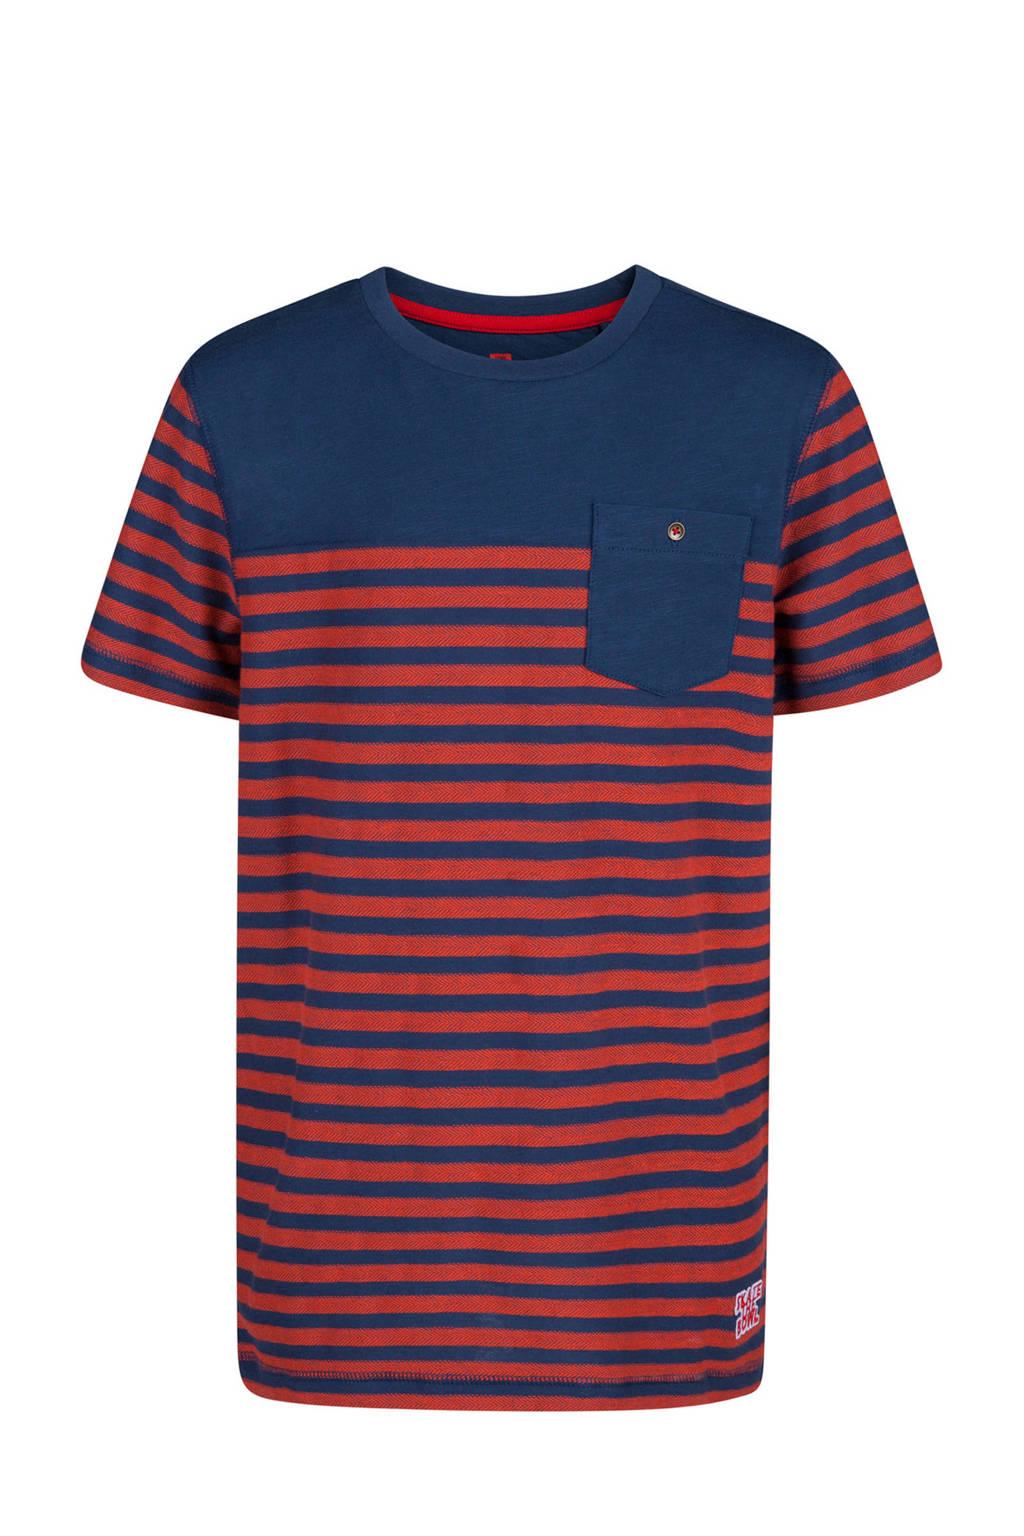 WE Fashion gestreept T-shirt rood/blauw, Rood/blauw